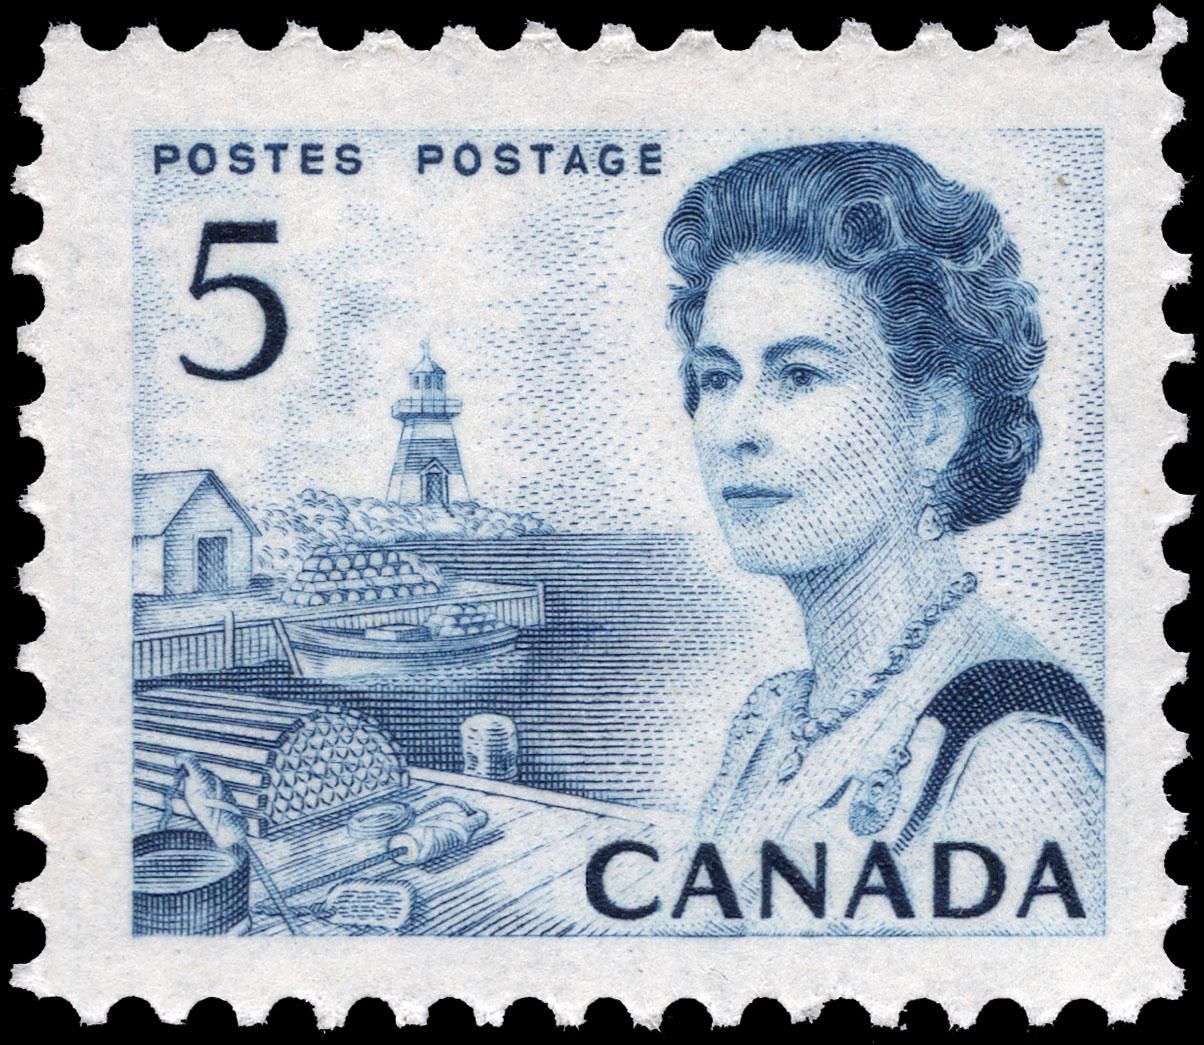 Queen Elizabeth II, Atlantic Coast Canada Postage Stamp